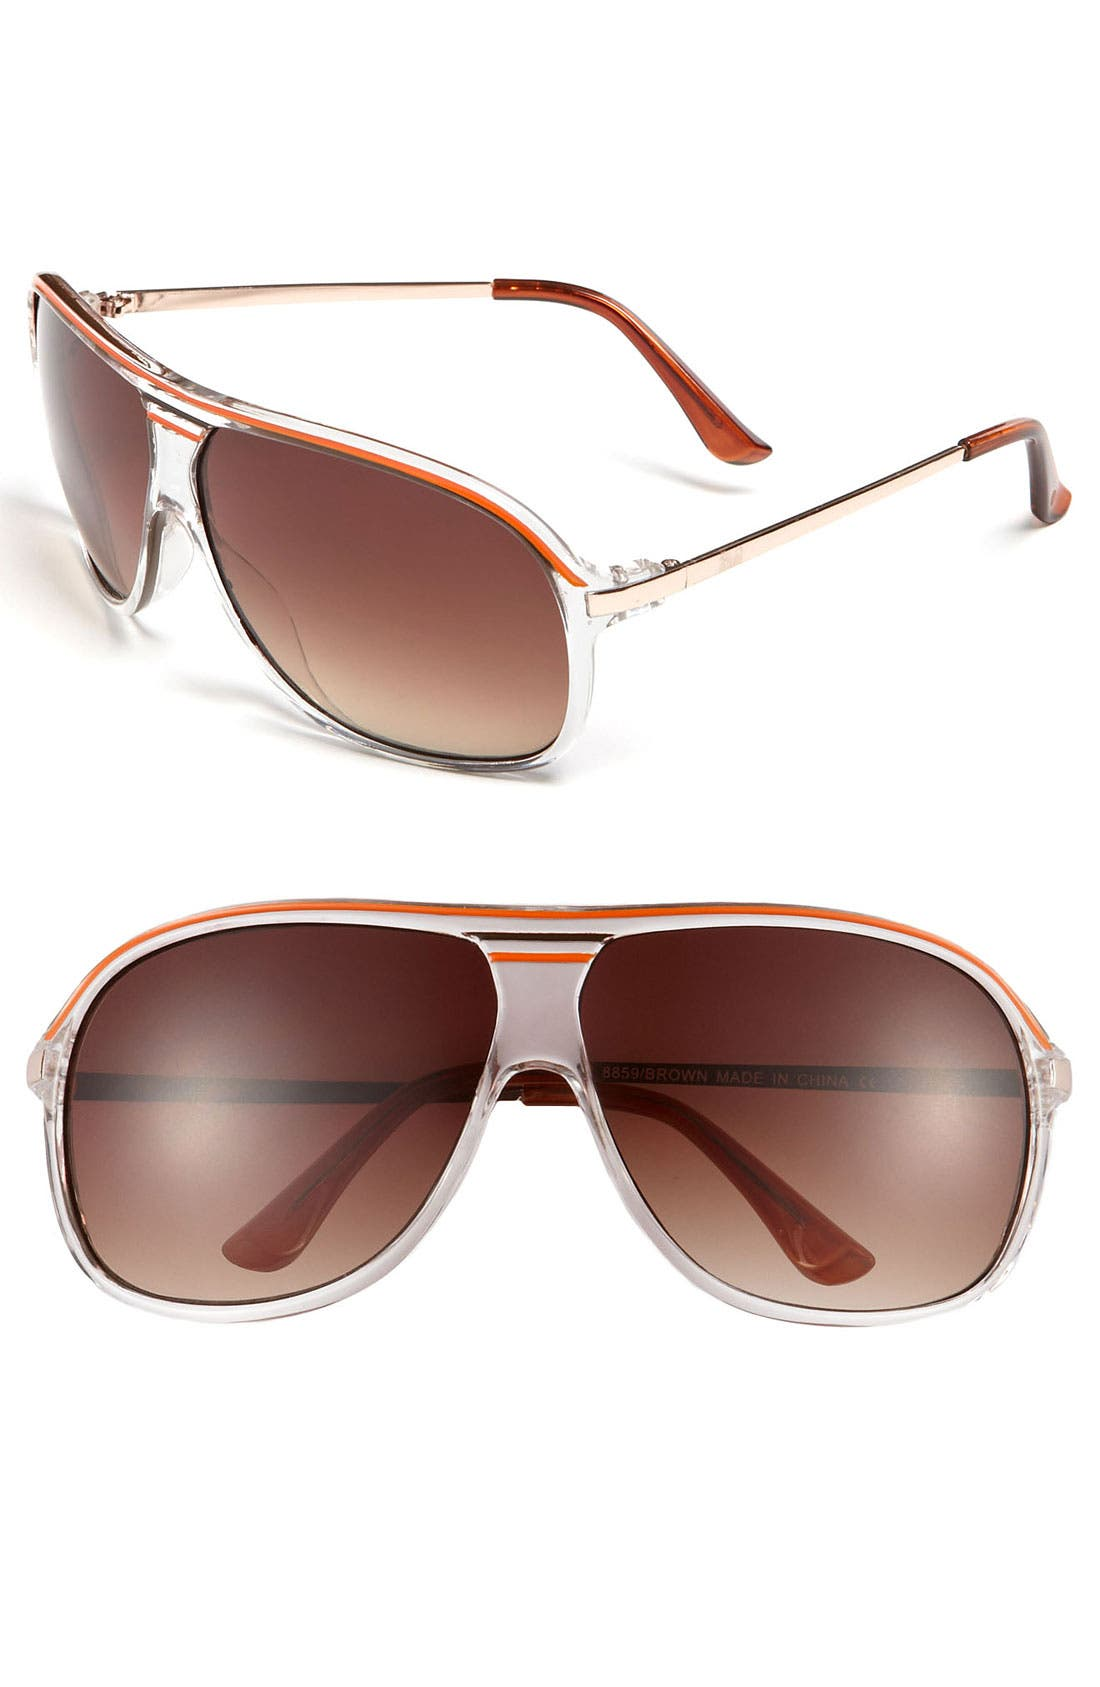 Main Image - KW 'Quest' Aviator Sunglasses